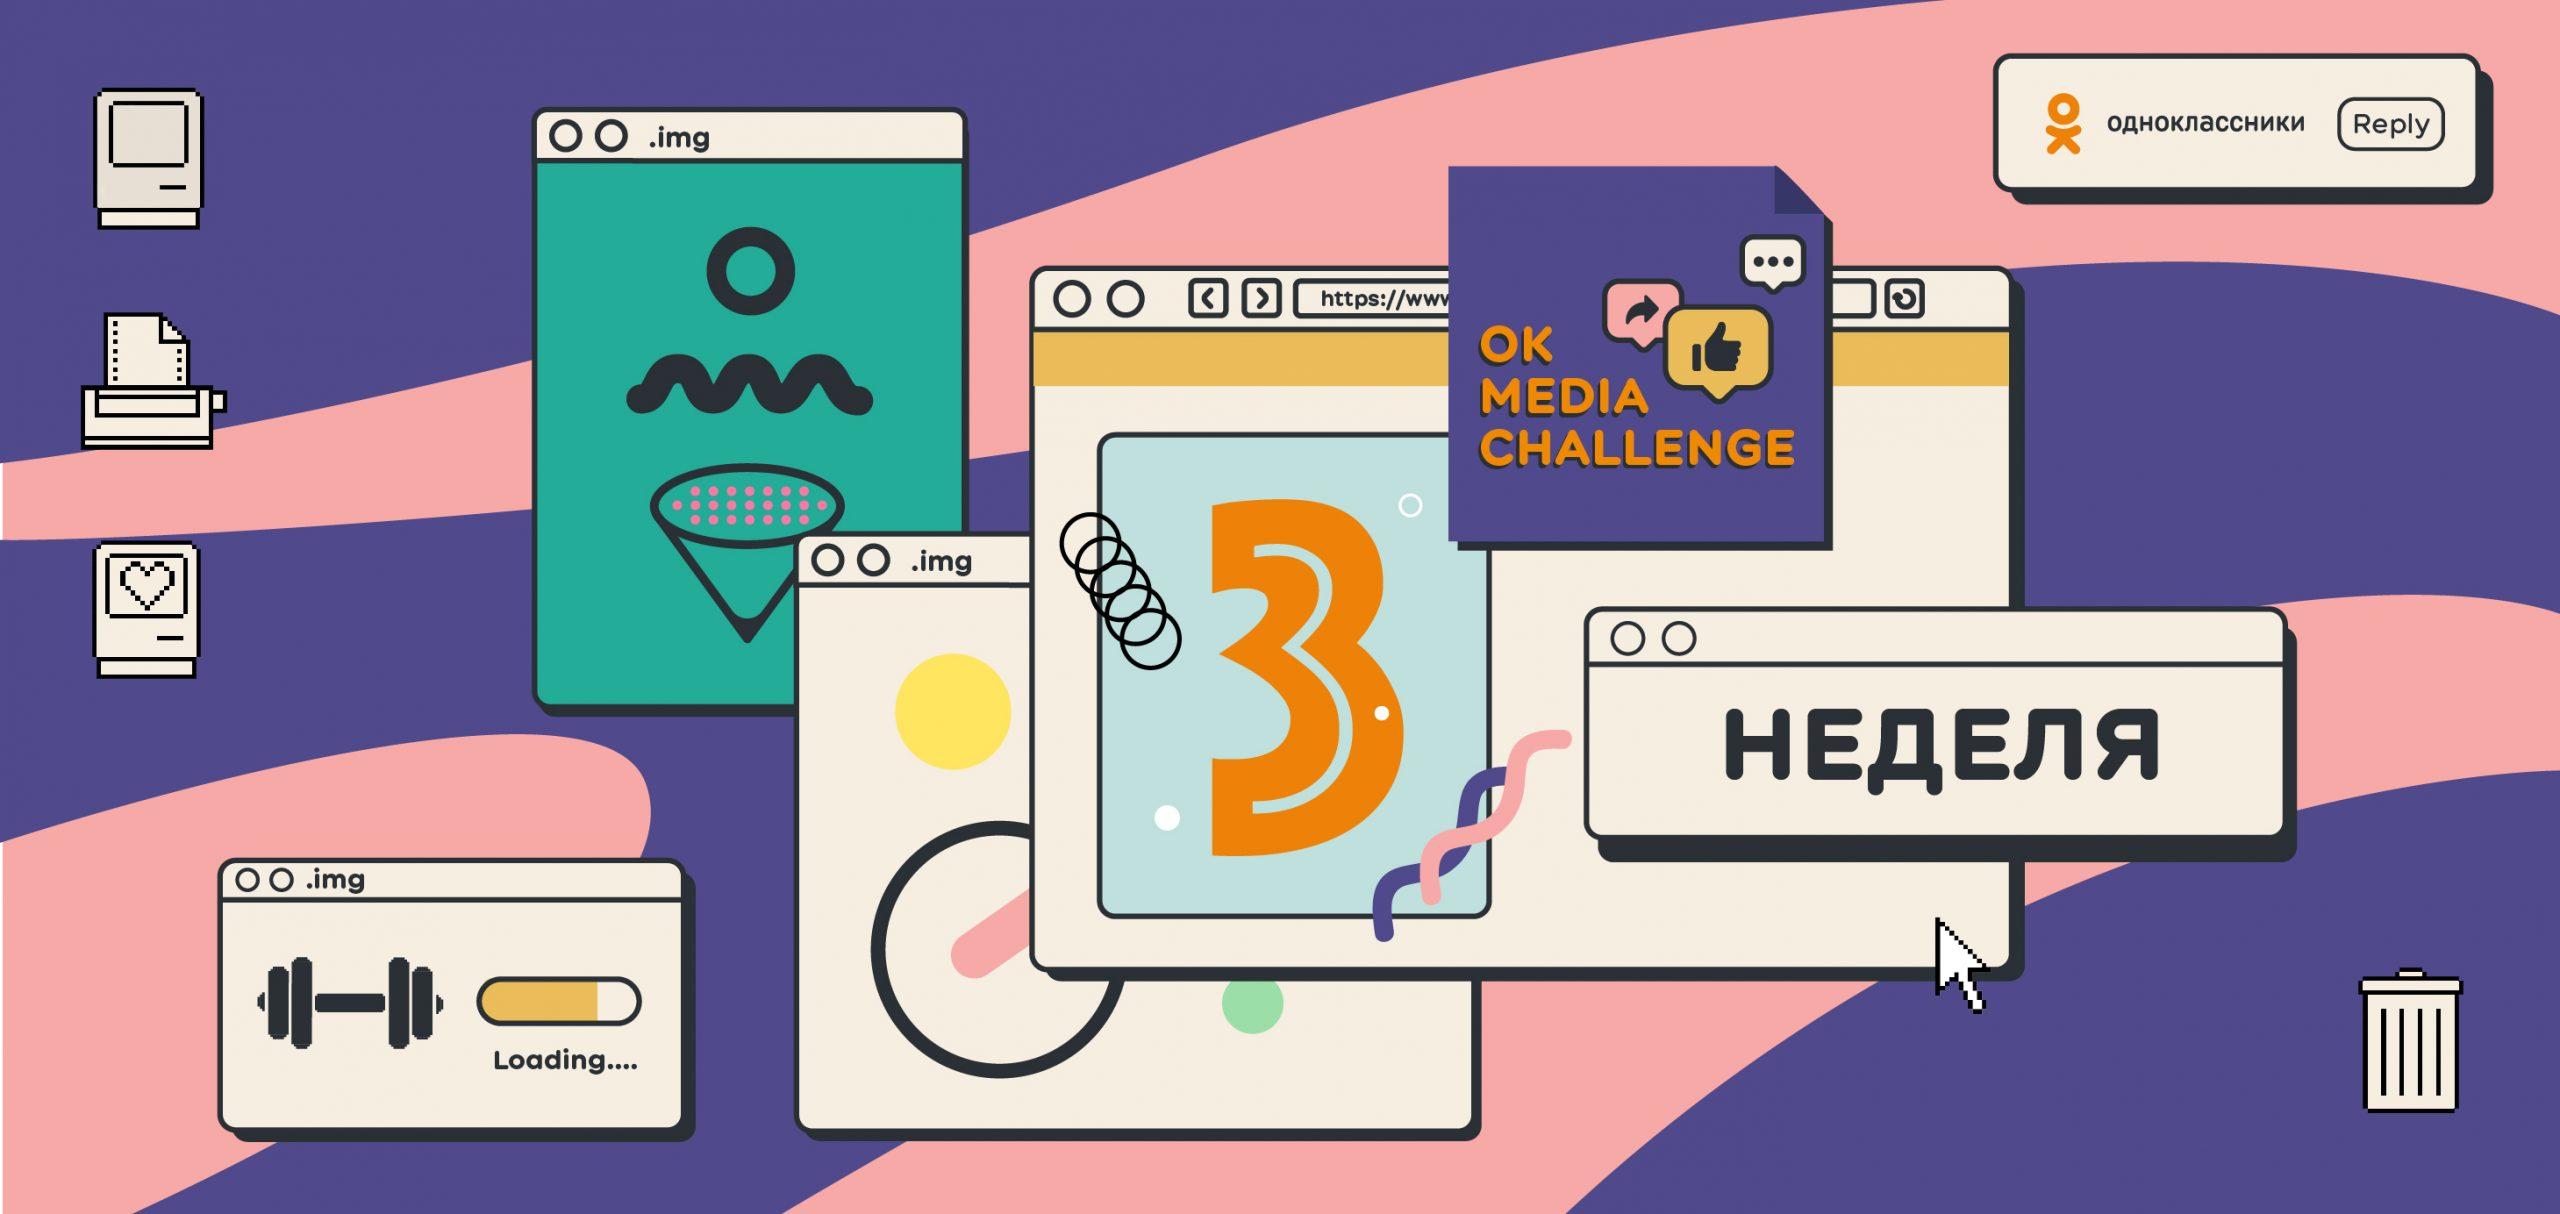 OK Media Challenge 2020: Итоги третьей недели